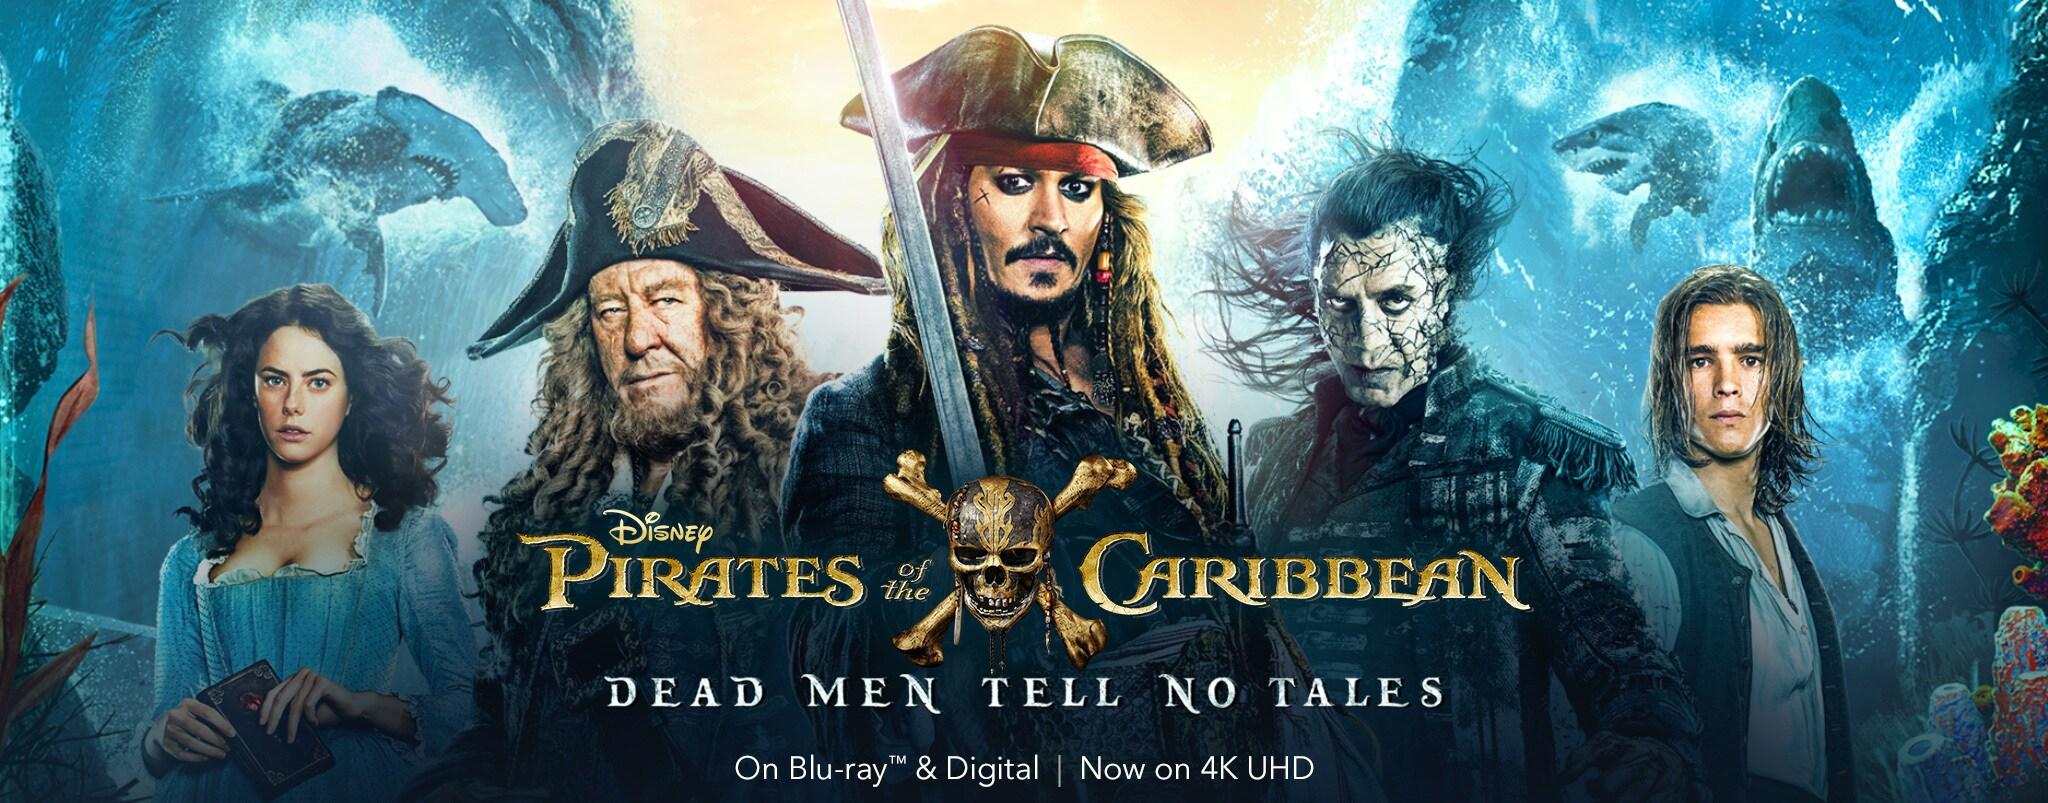 Pirates 5 VFX team talk 'de-ageing' Johnny Depp and Salazar effects